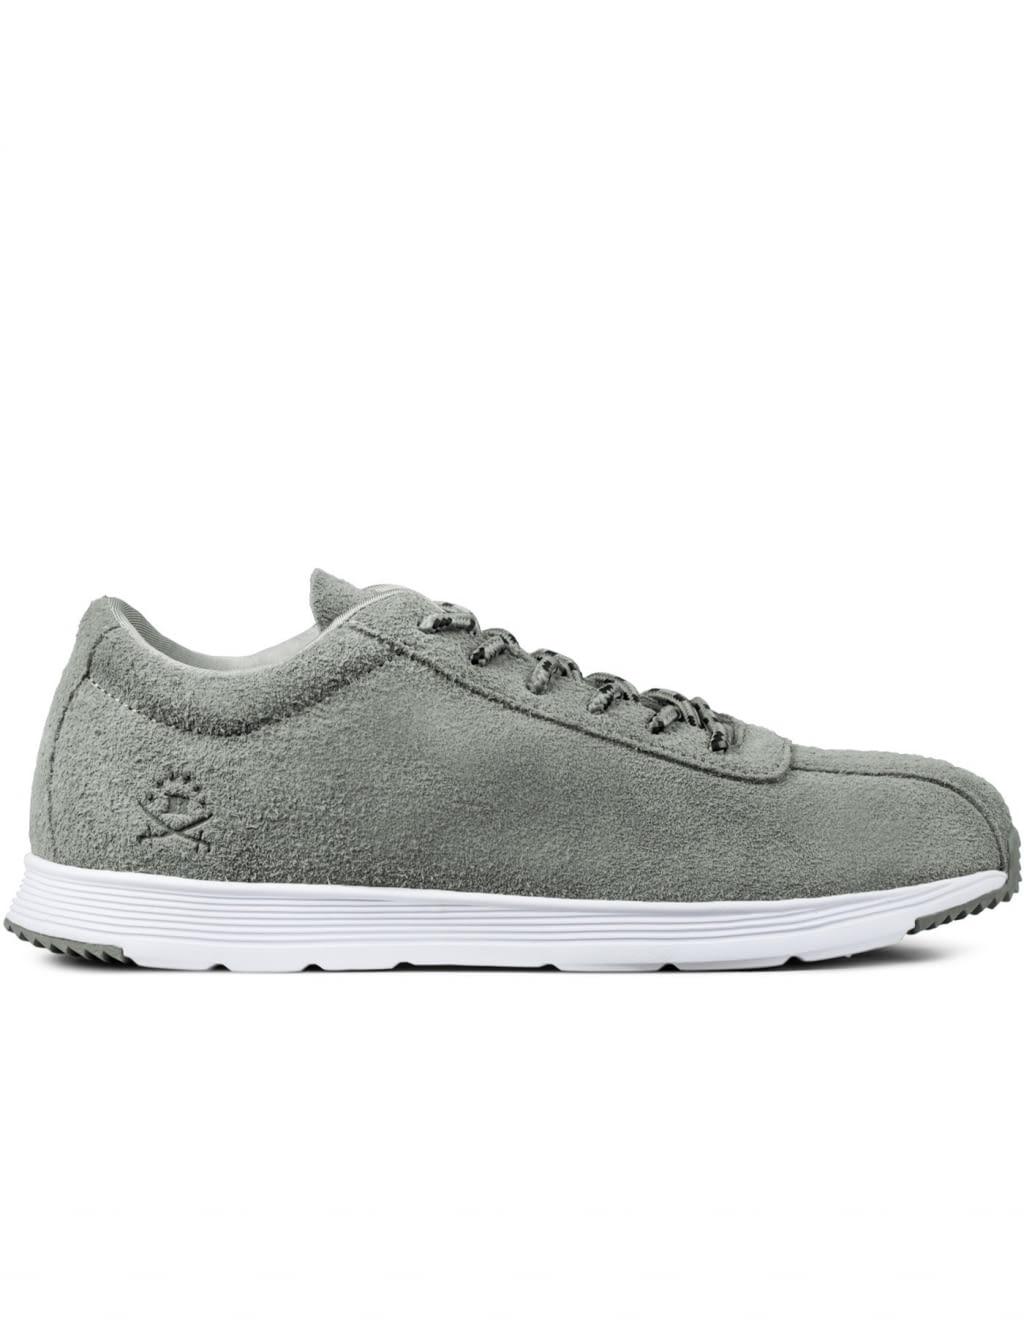 Jual Ransom Grey Field Lite Shoes 100 Original Bobobobo Atsthelabel Eeva Black Top